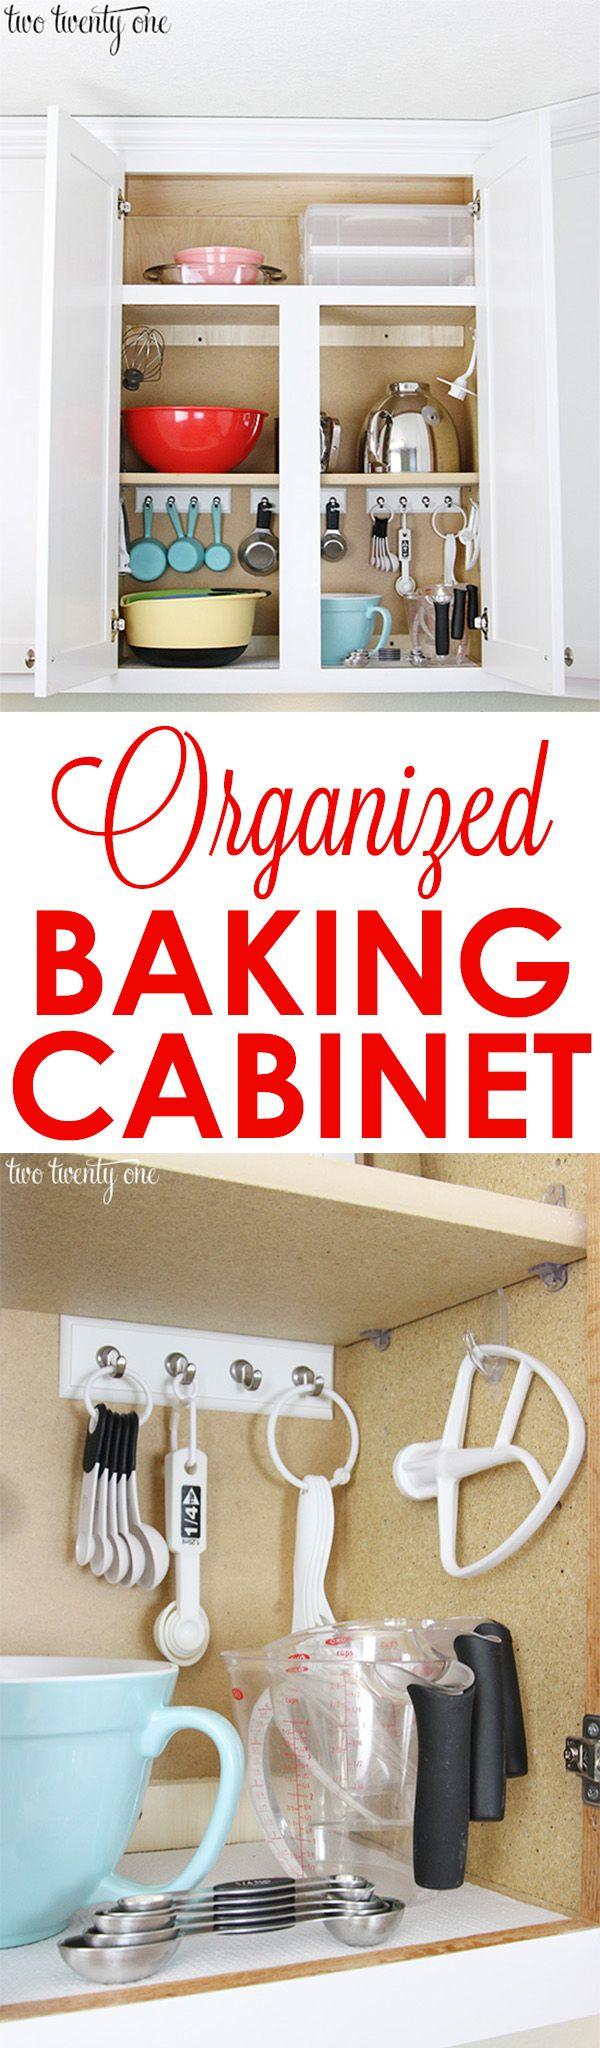 Organized baking cabinet rangement organisation et - Rangement maison organisation ...